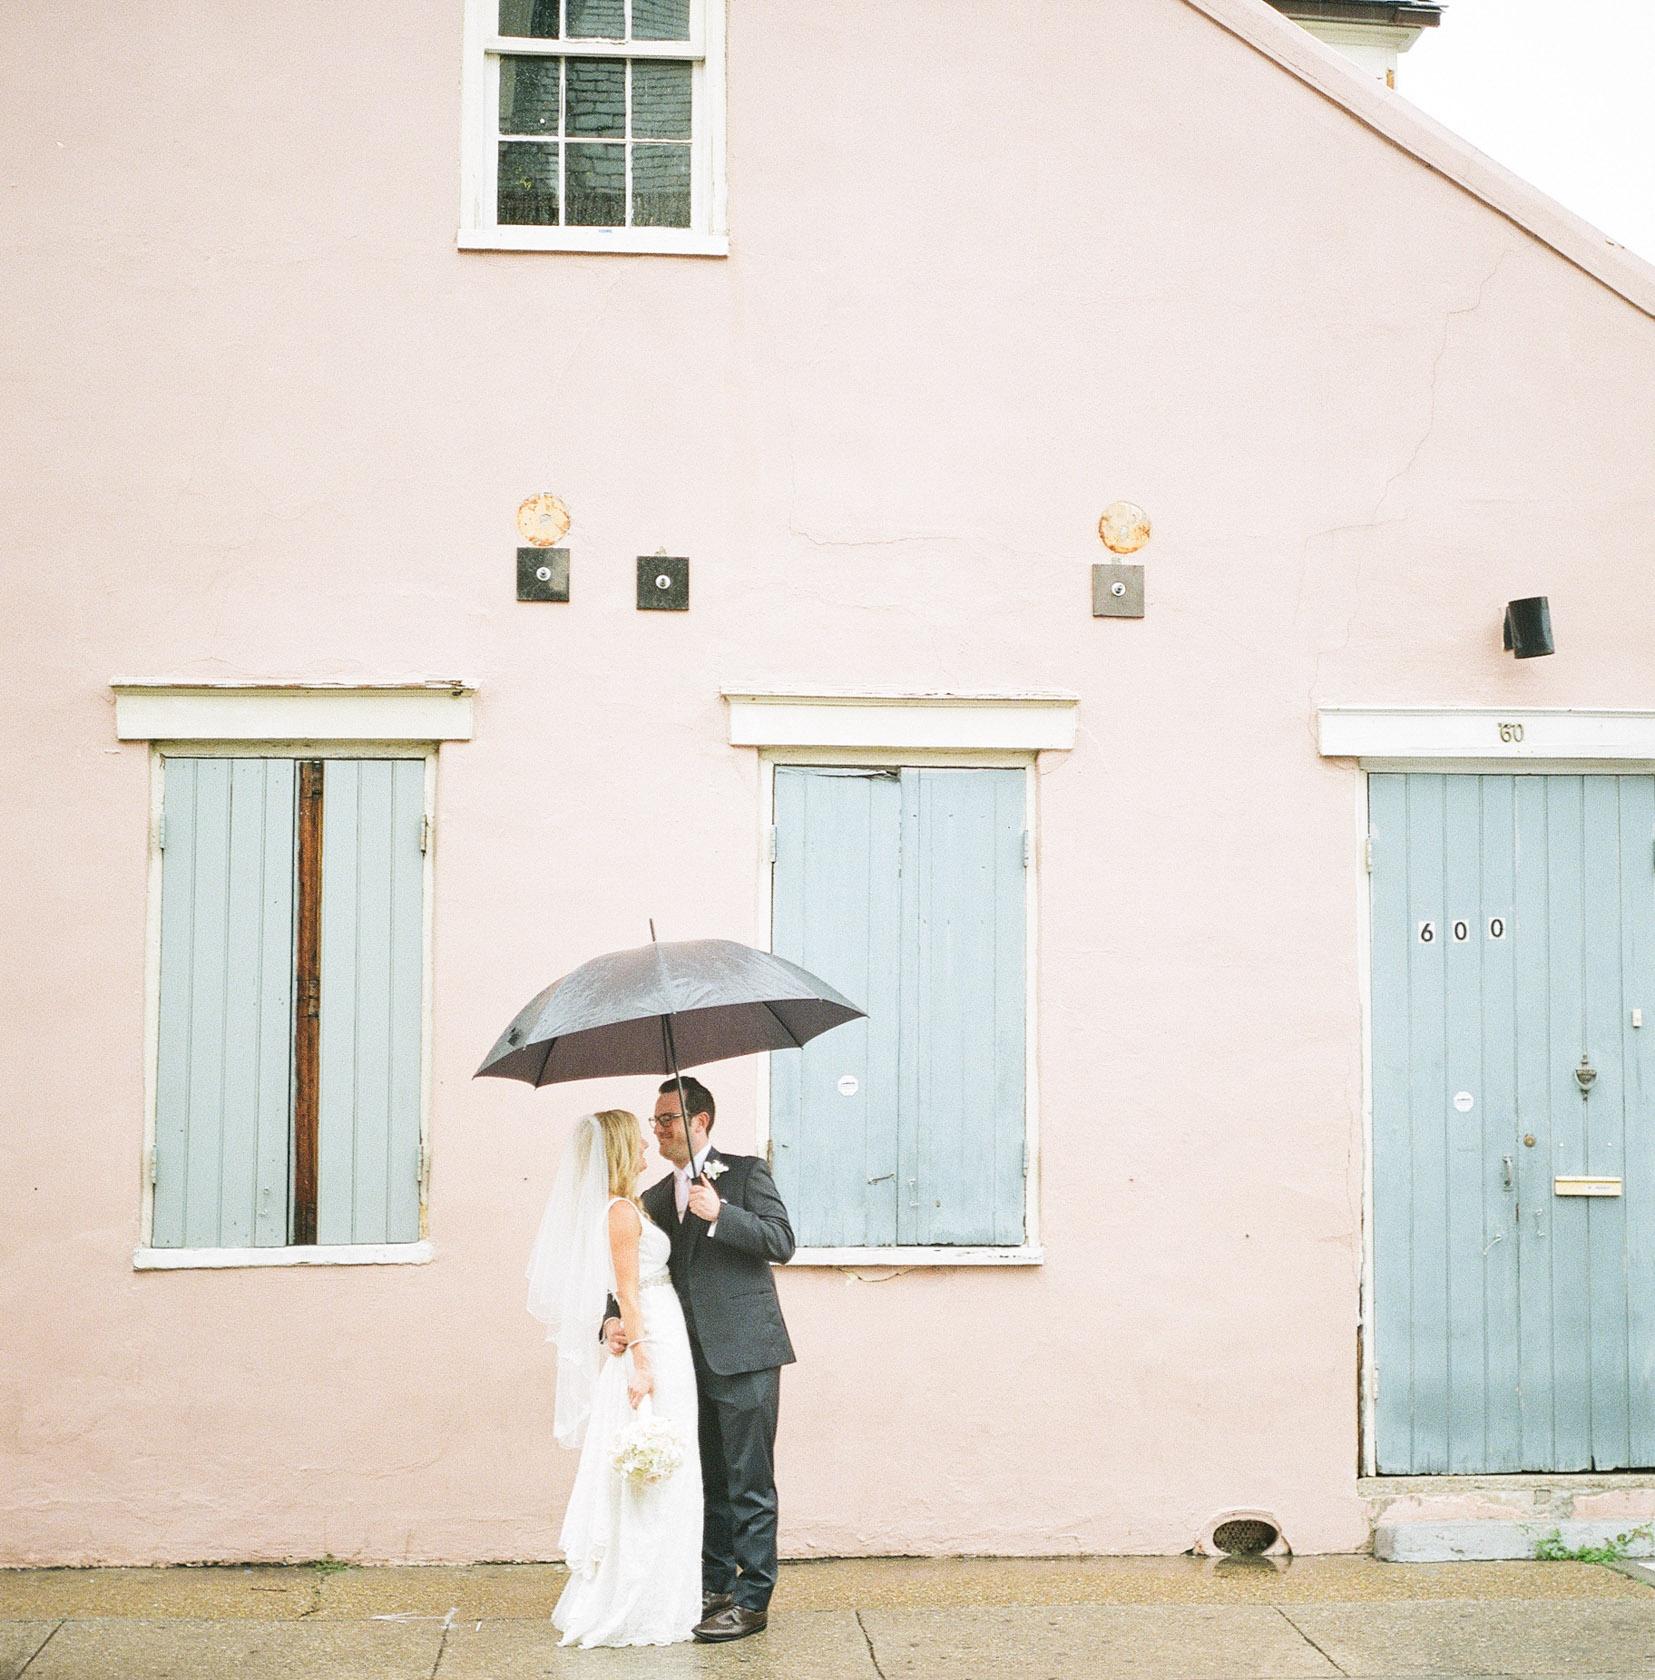 maison dupuy wedding on film 12